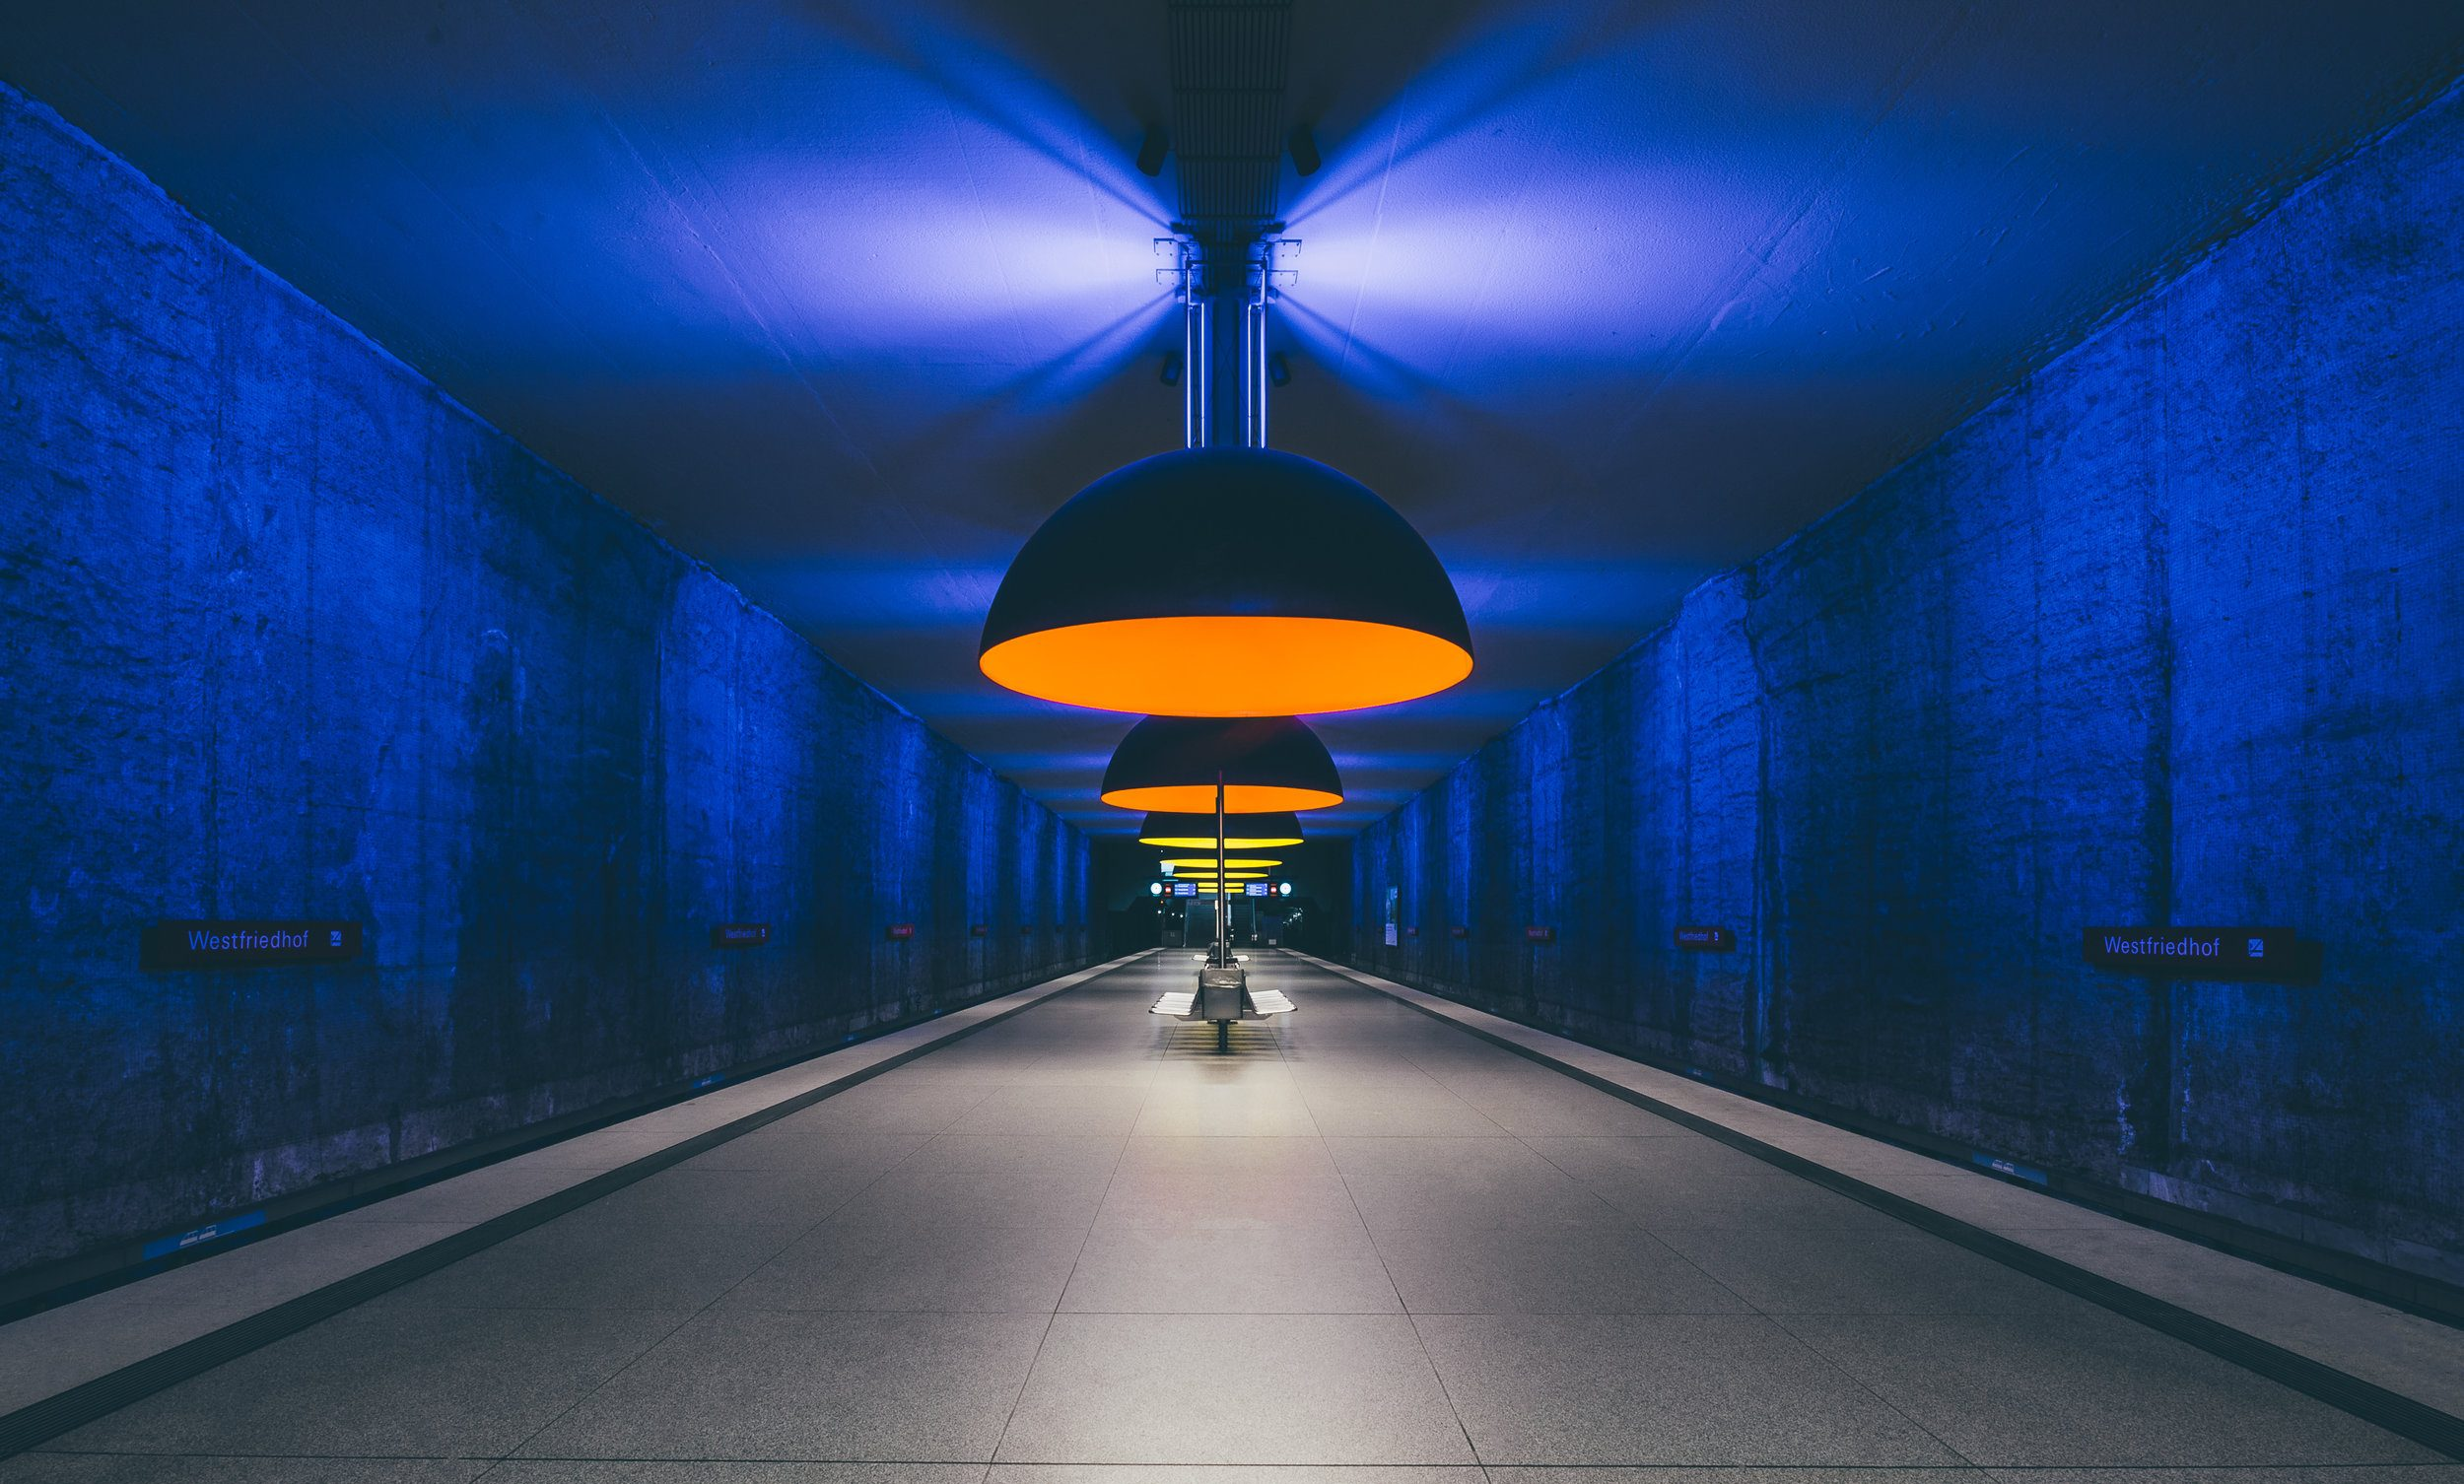 Stații de metrou spectaculoase din lume. Stația Westfriedhof, Munchen,